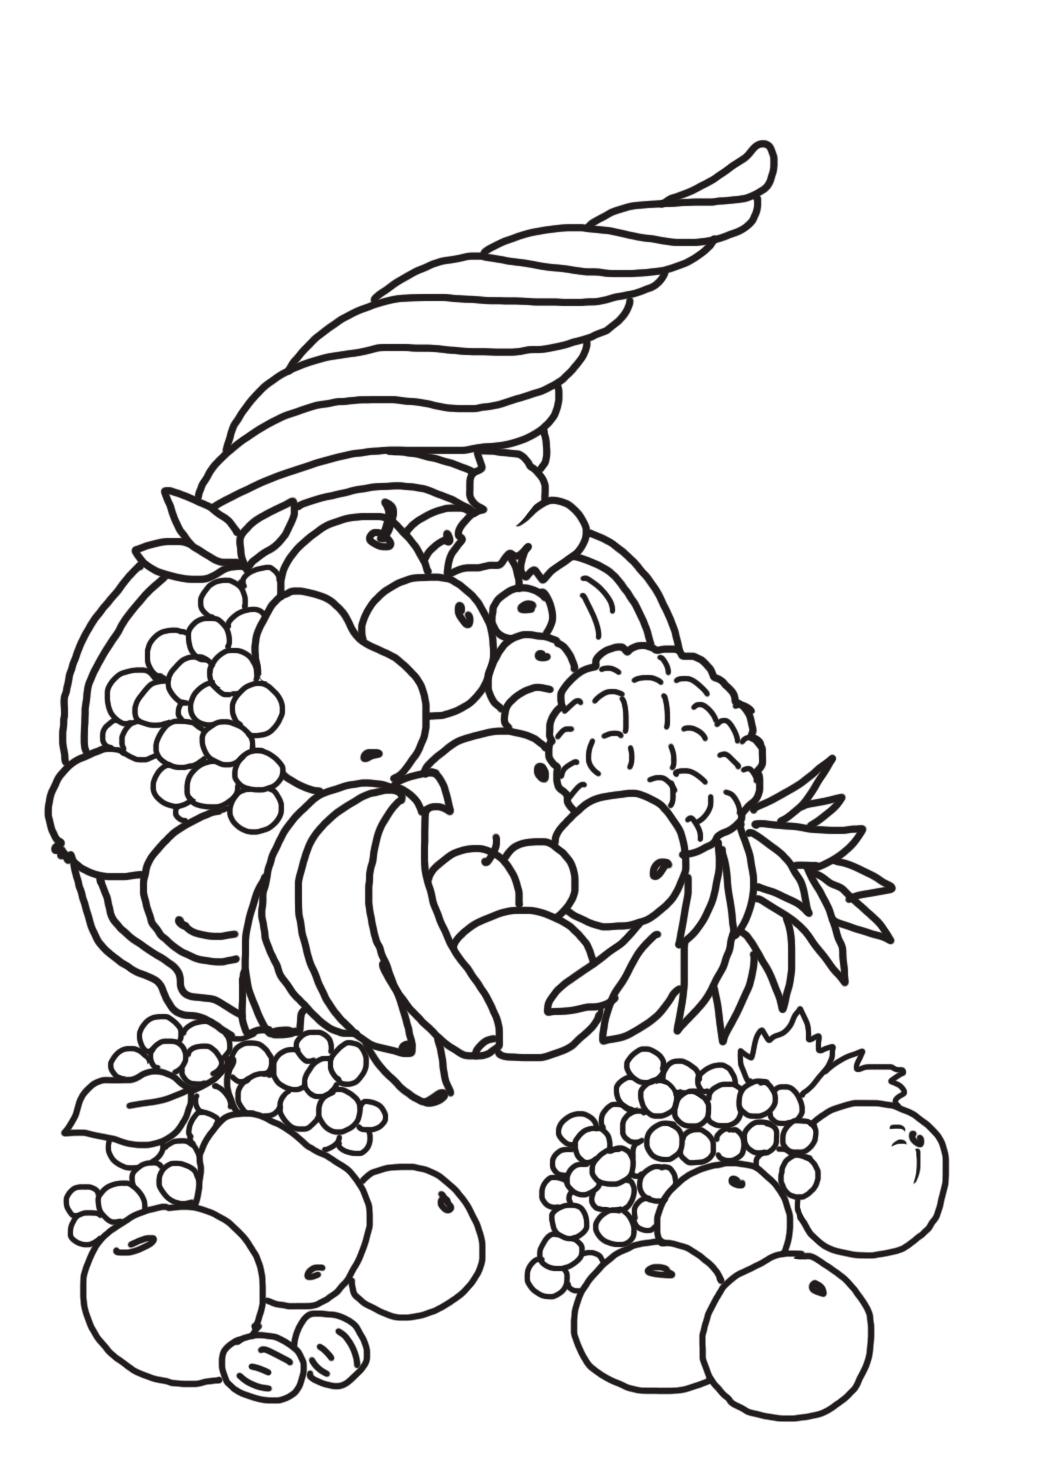 Thanksgiving cornucopia with fruits